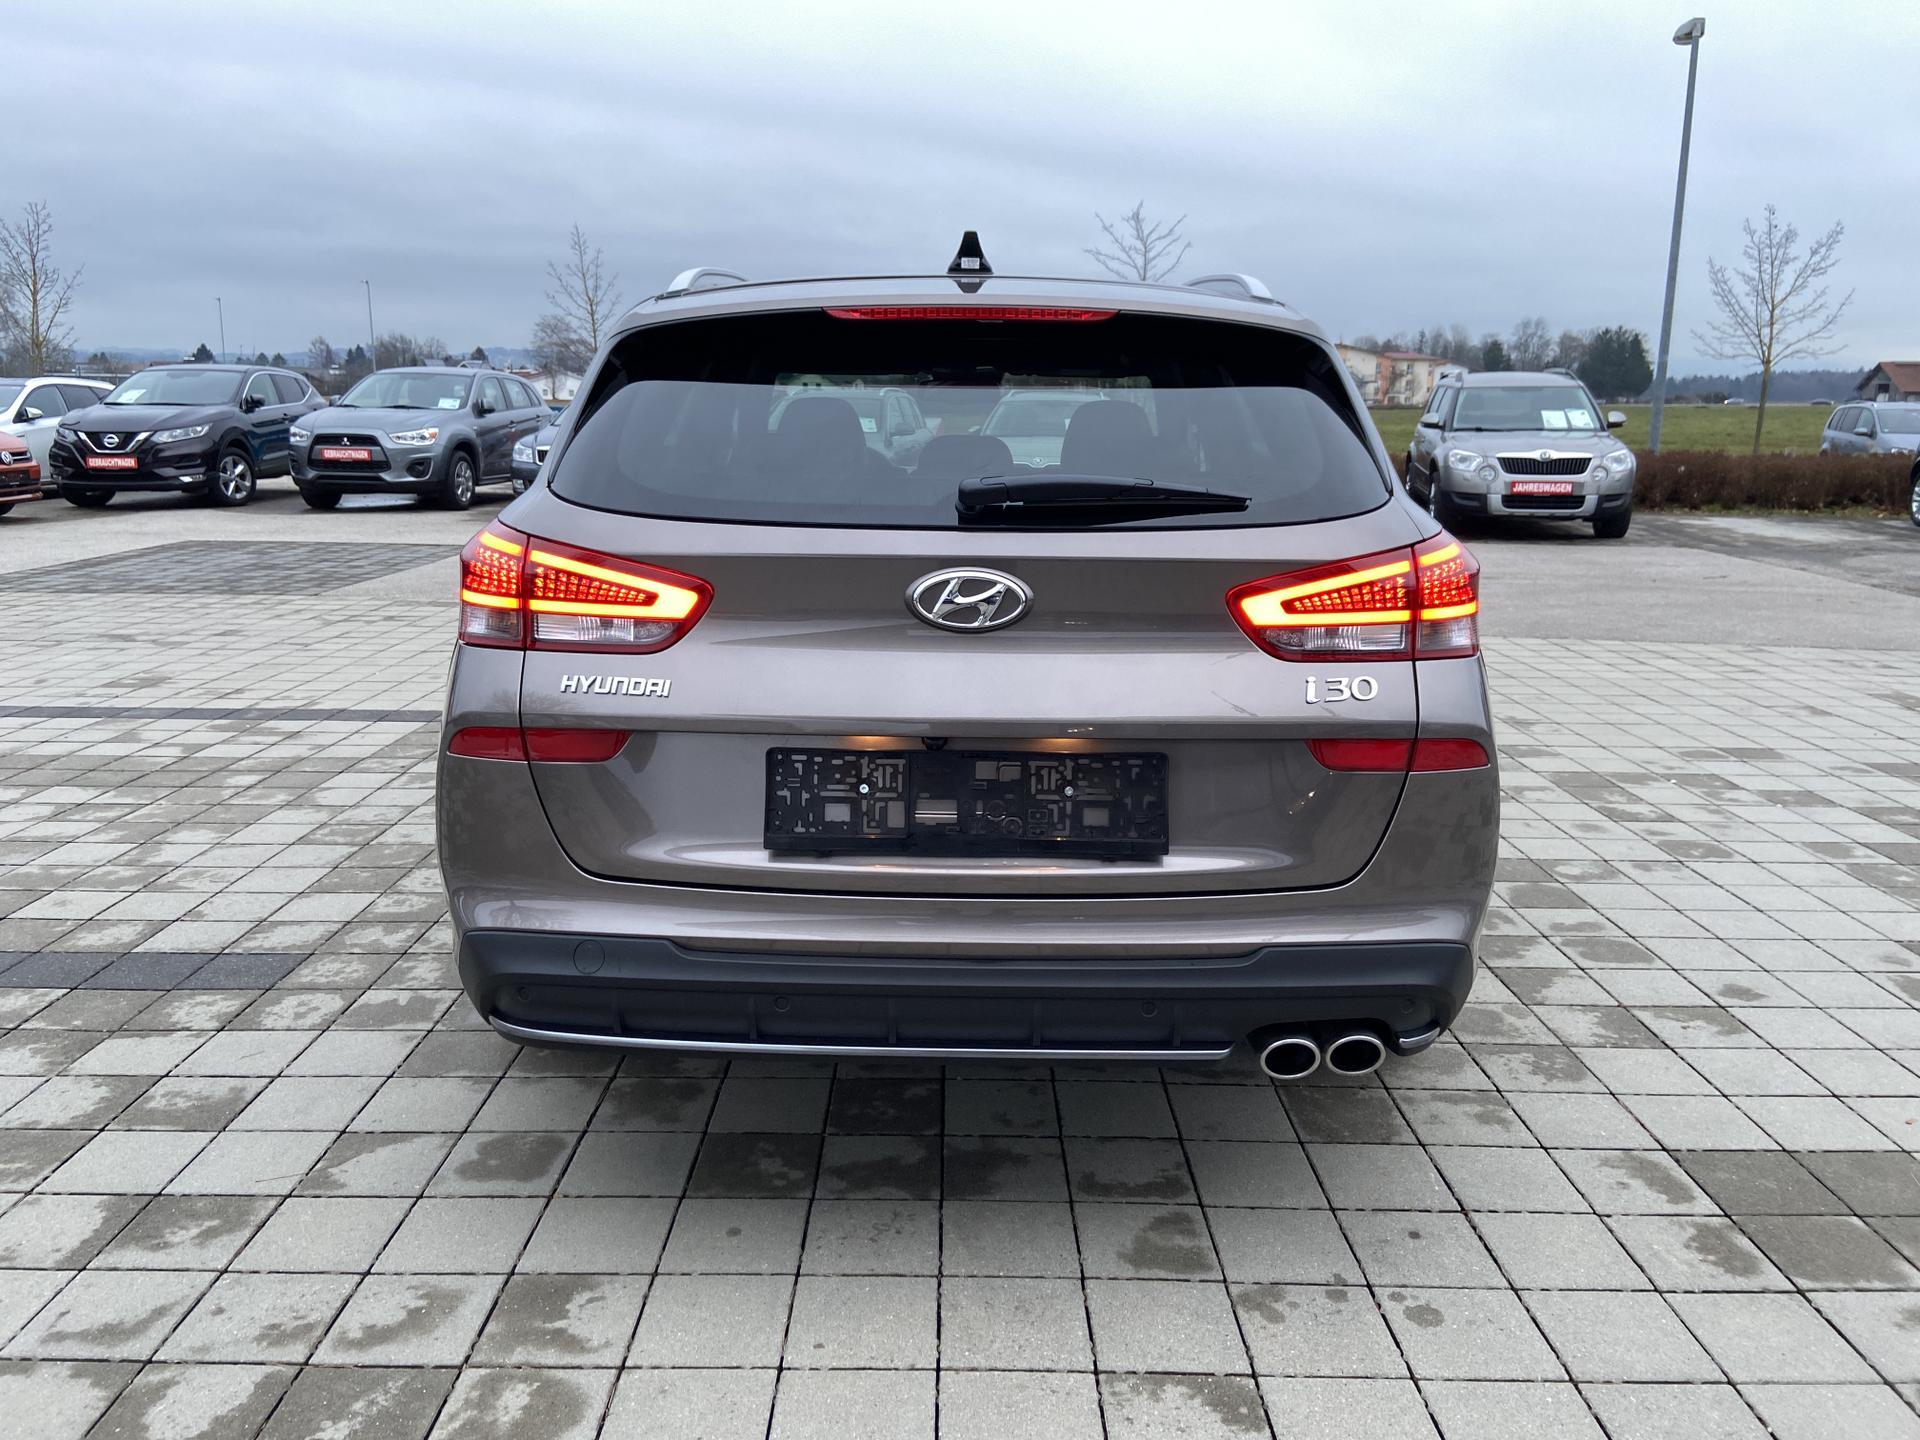 Hyundai i30 Kombi in der N-Line